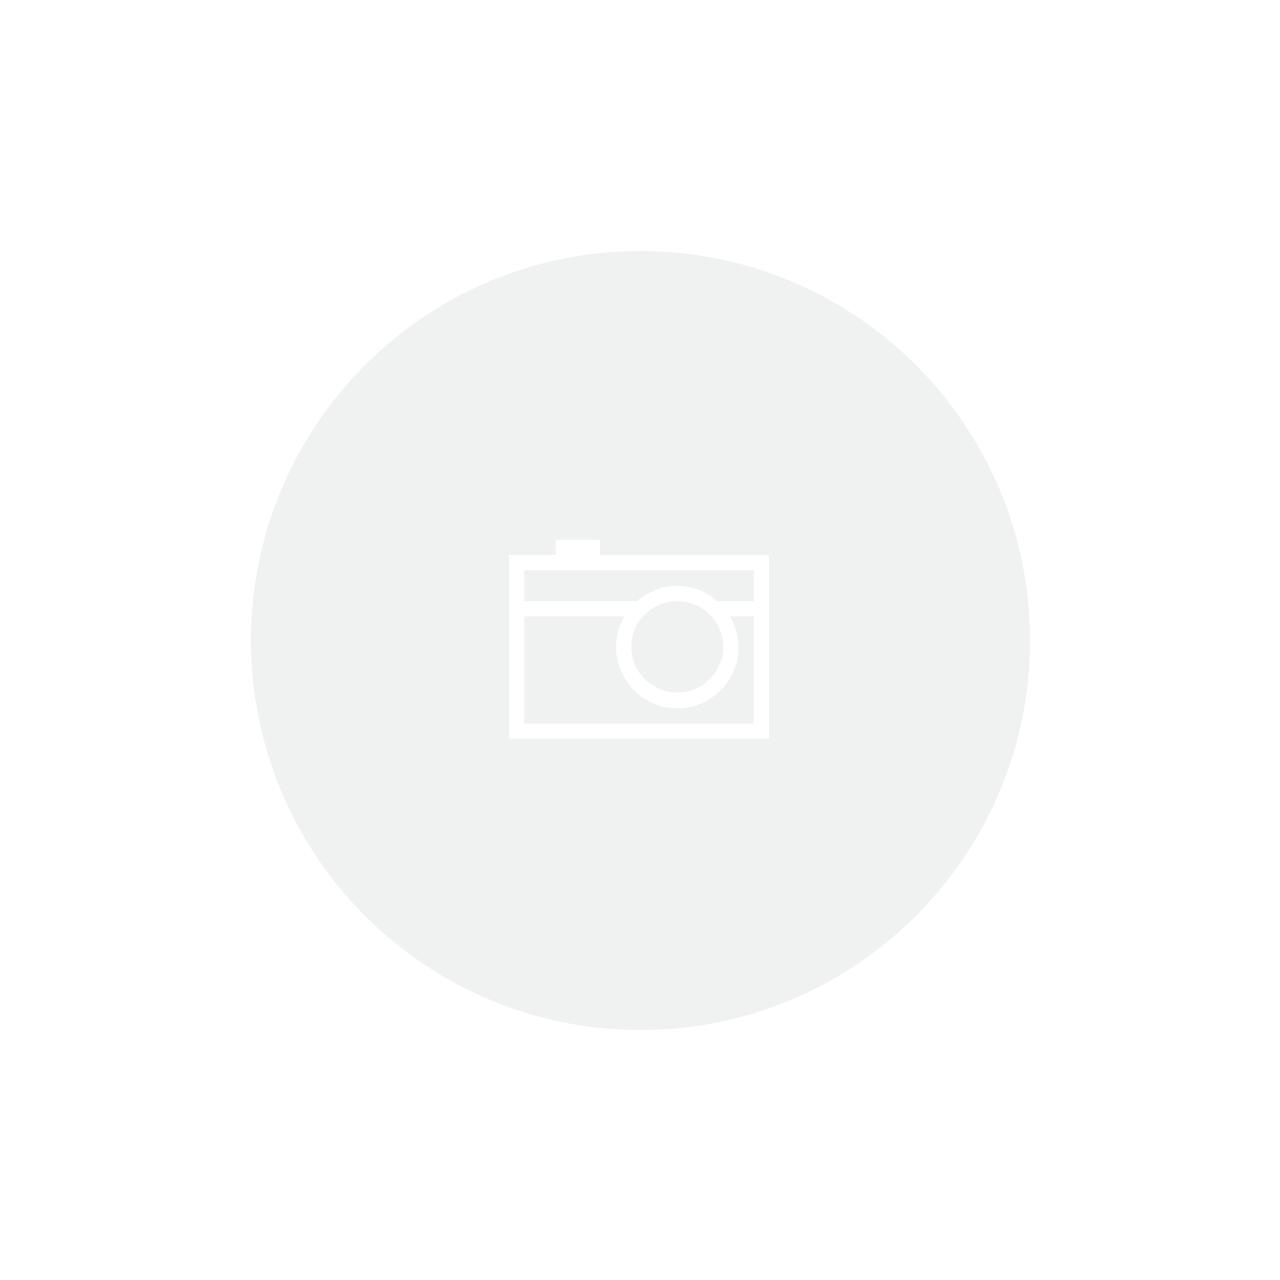 Batedor Manual Inox Tramontina